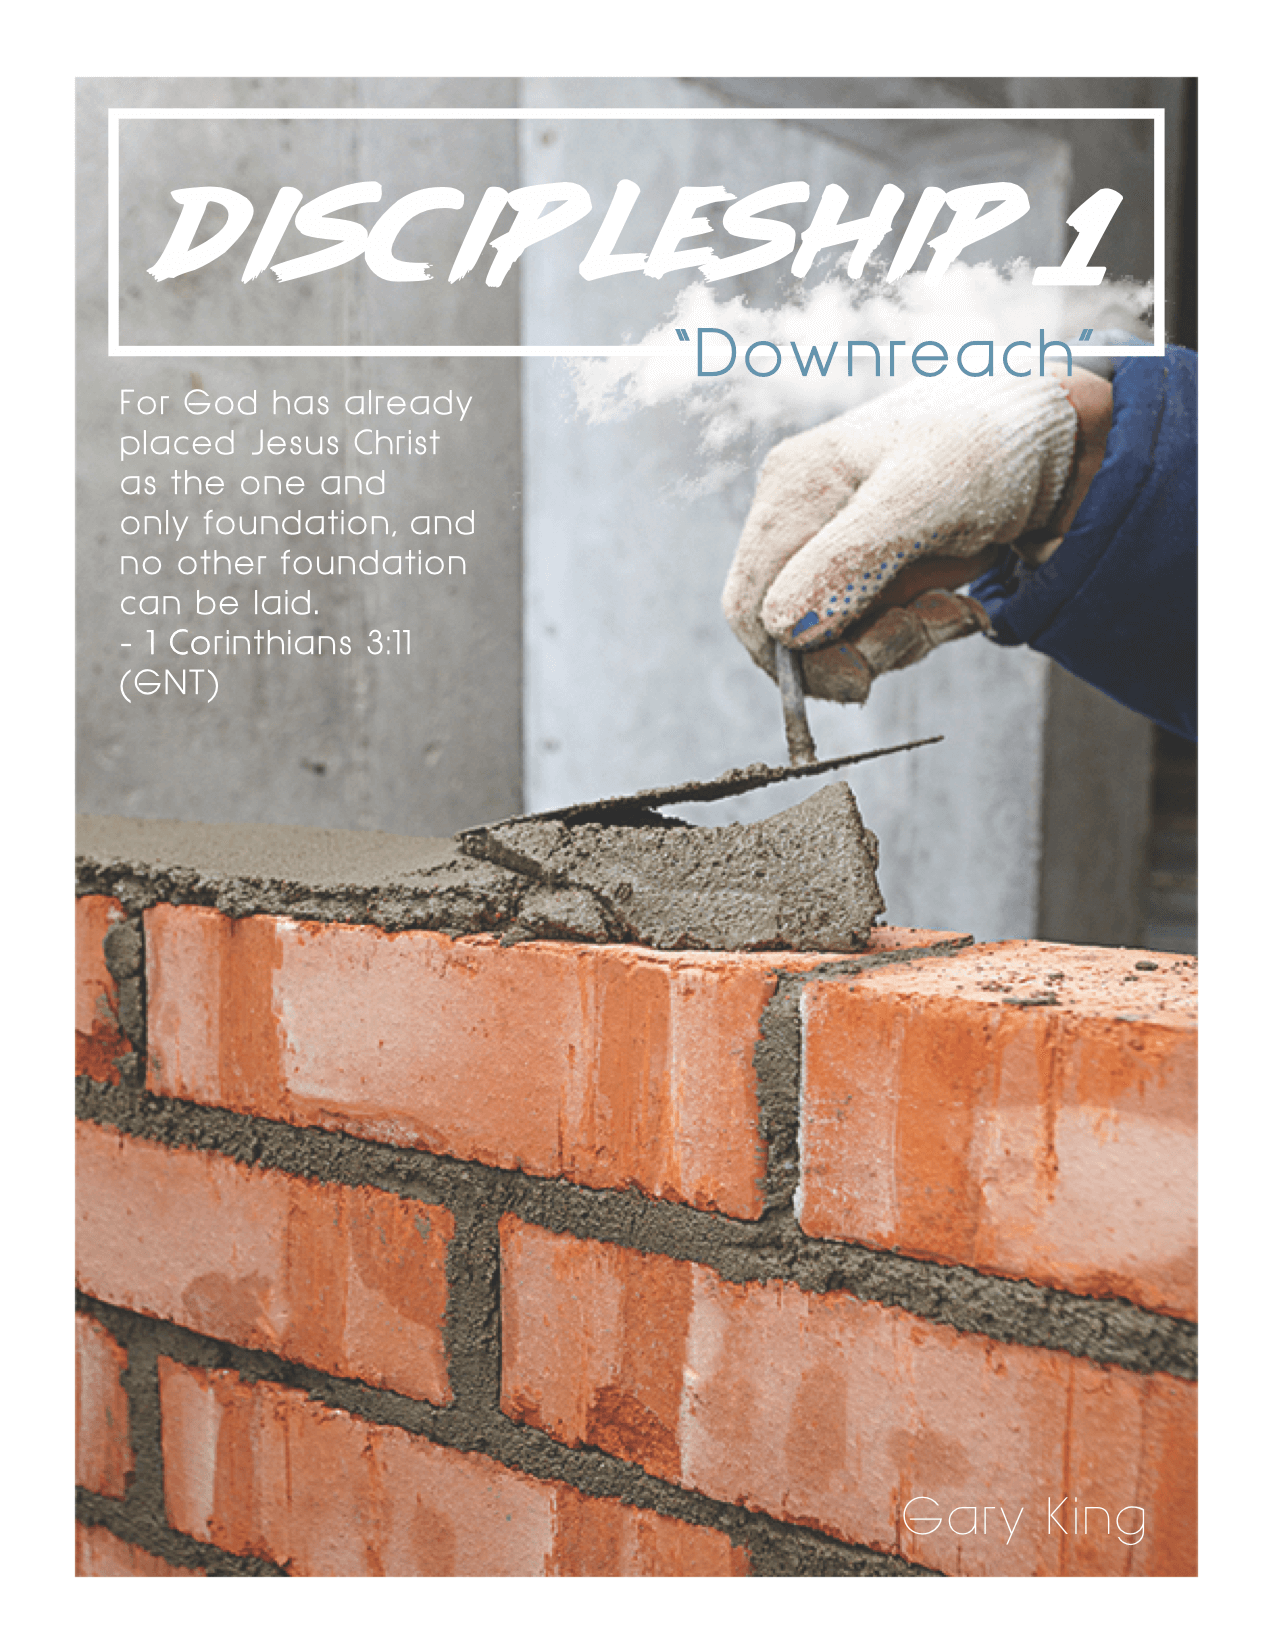 Discipleship 1 - DOWNREACH